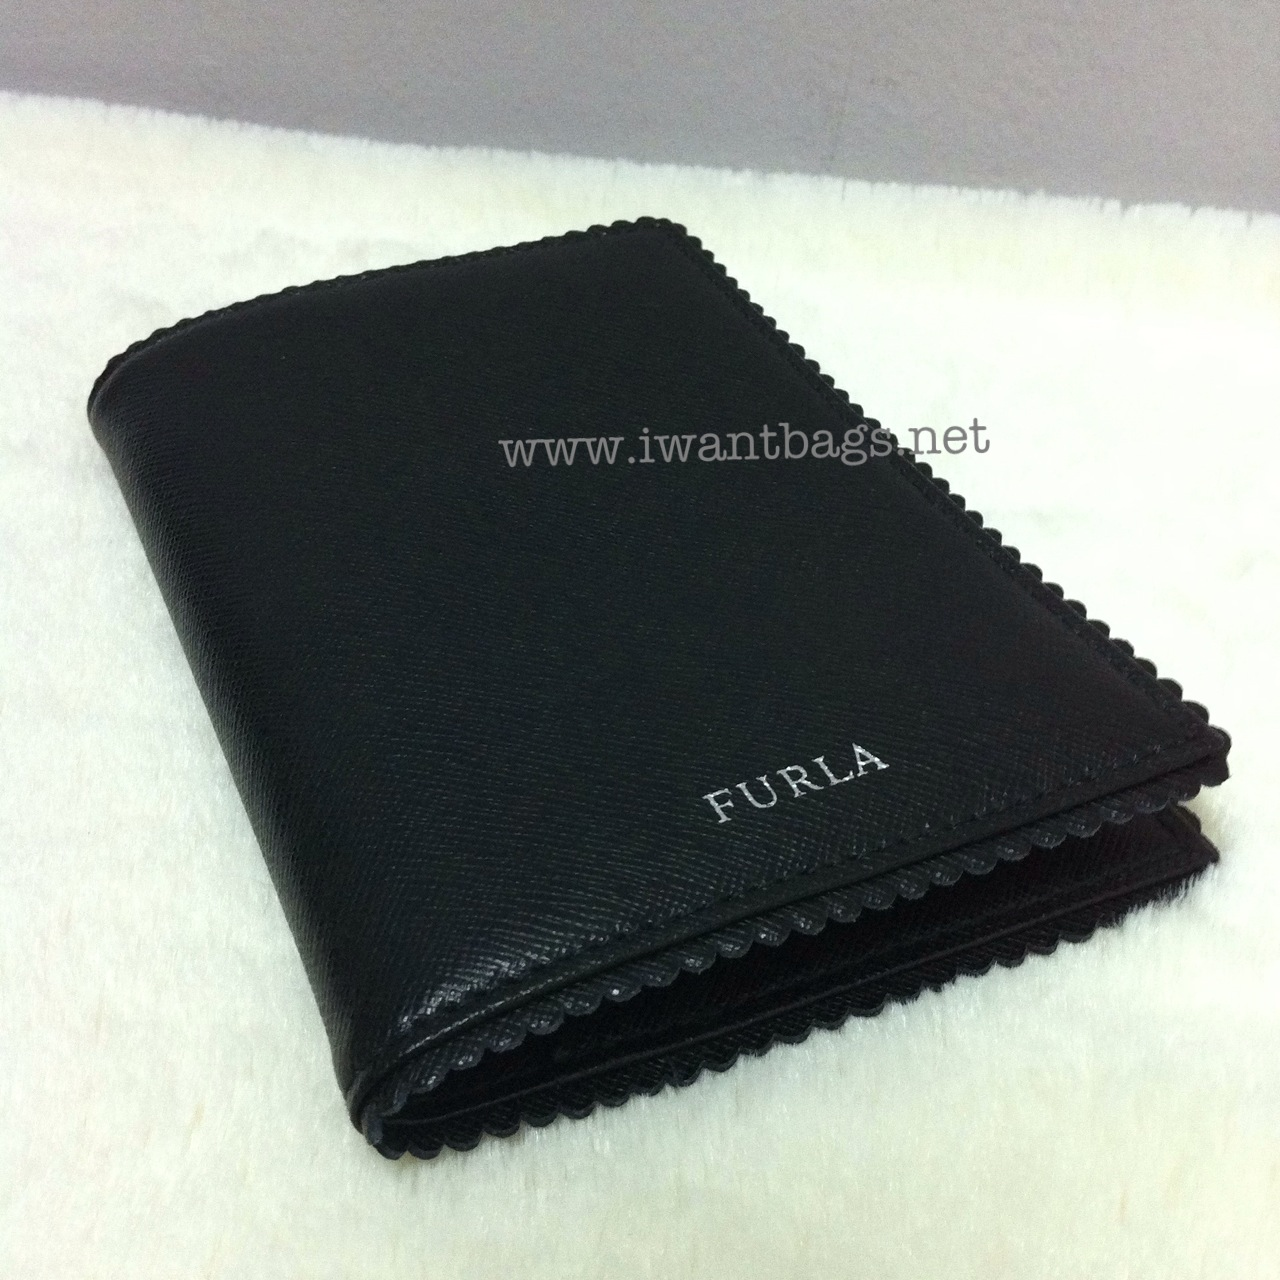 69a988885589 I Want Bags backup: Furla Leather Passport Holder